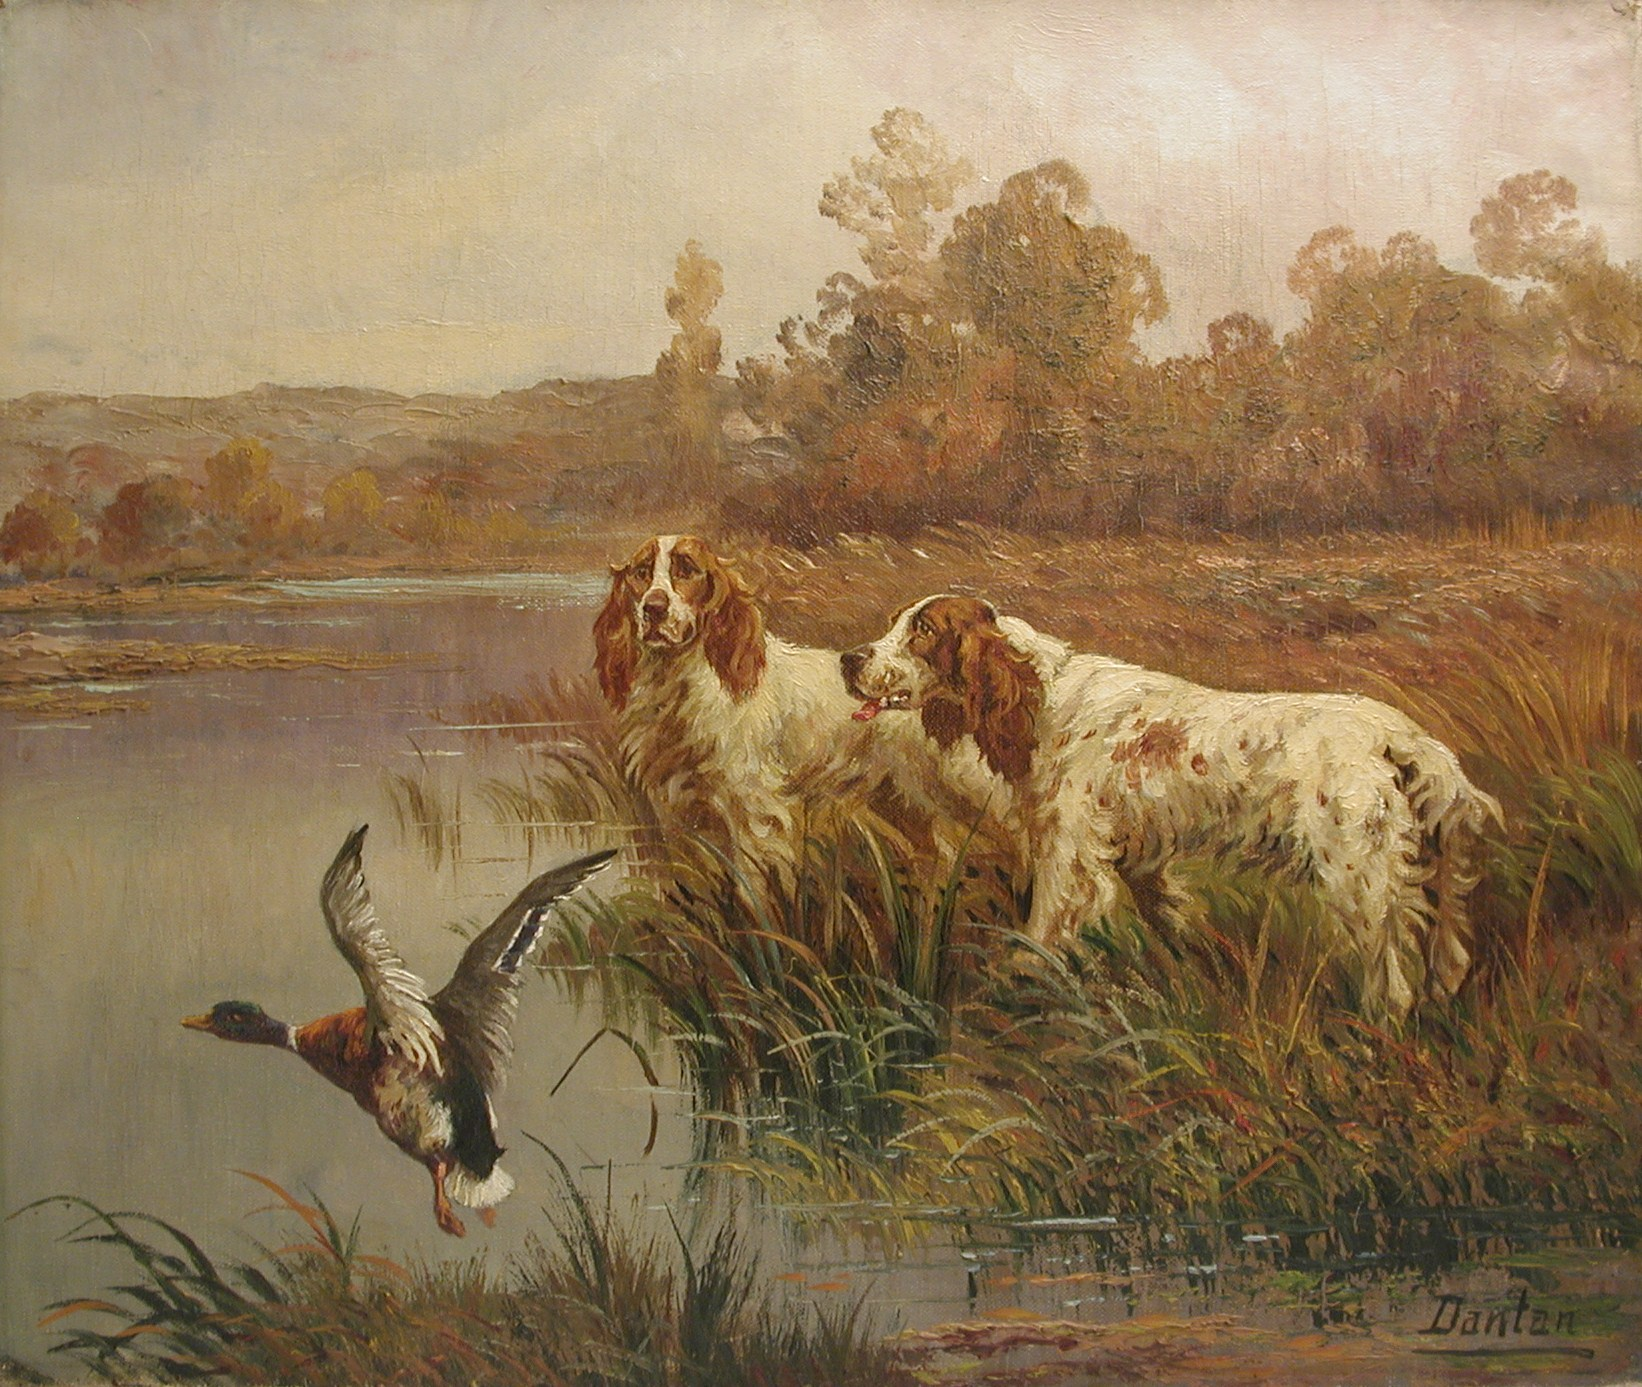 Click to see full size: Edouard Joseph Dantan (1848-1897)